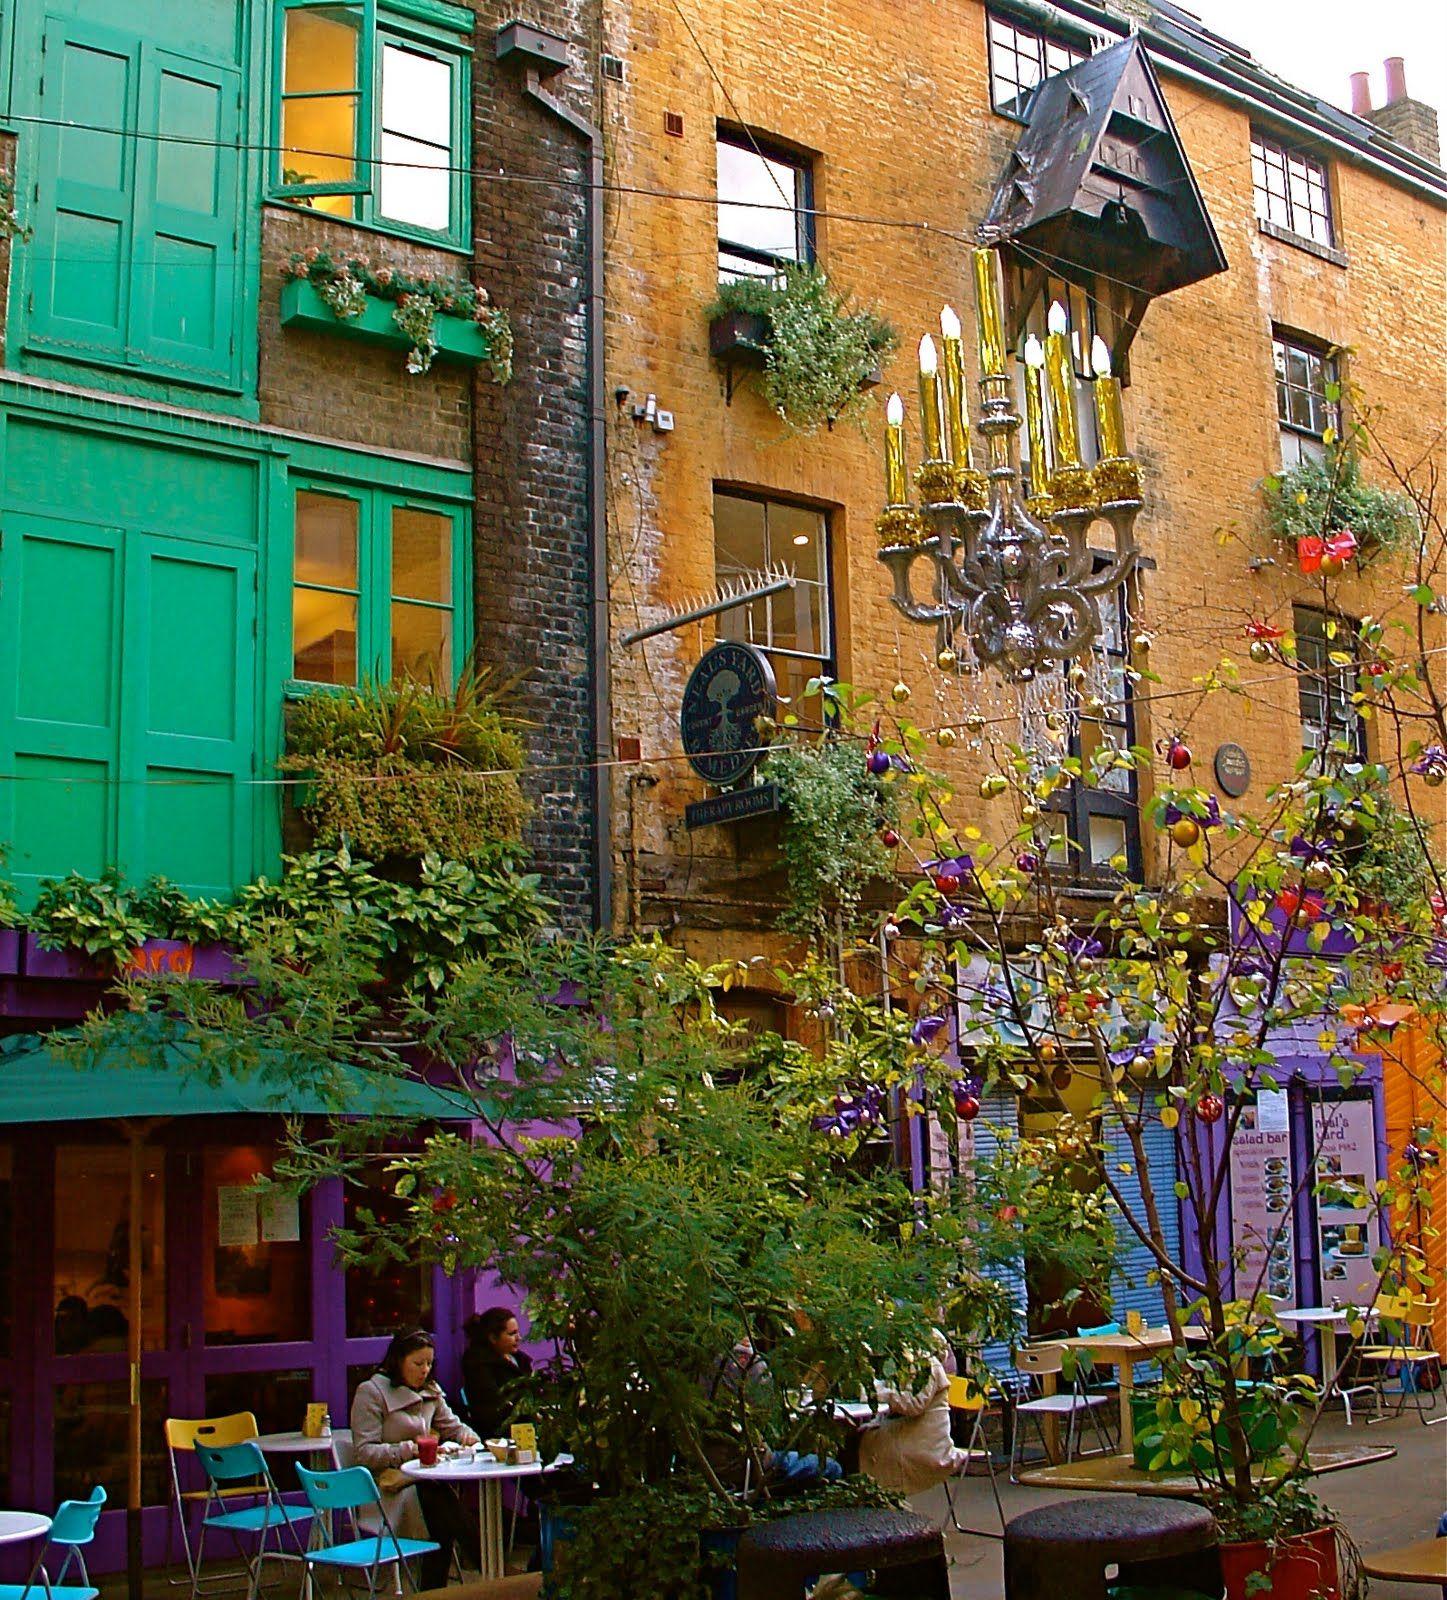 City garden colour scheme   Striking Chords in My Soul   Pinterest ...